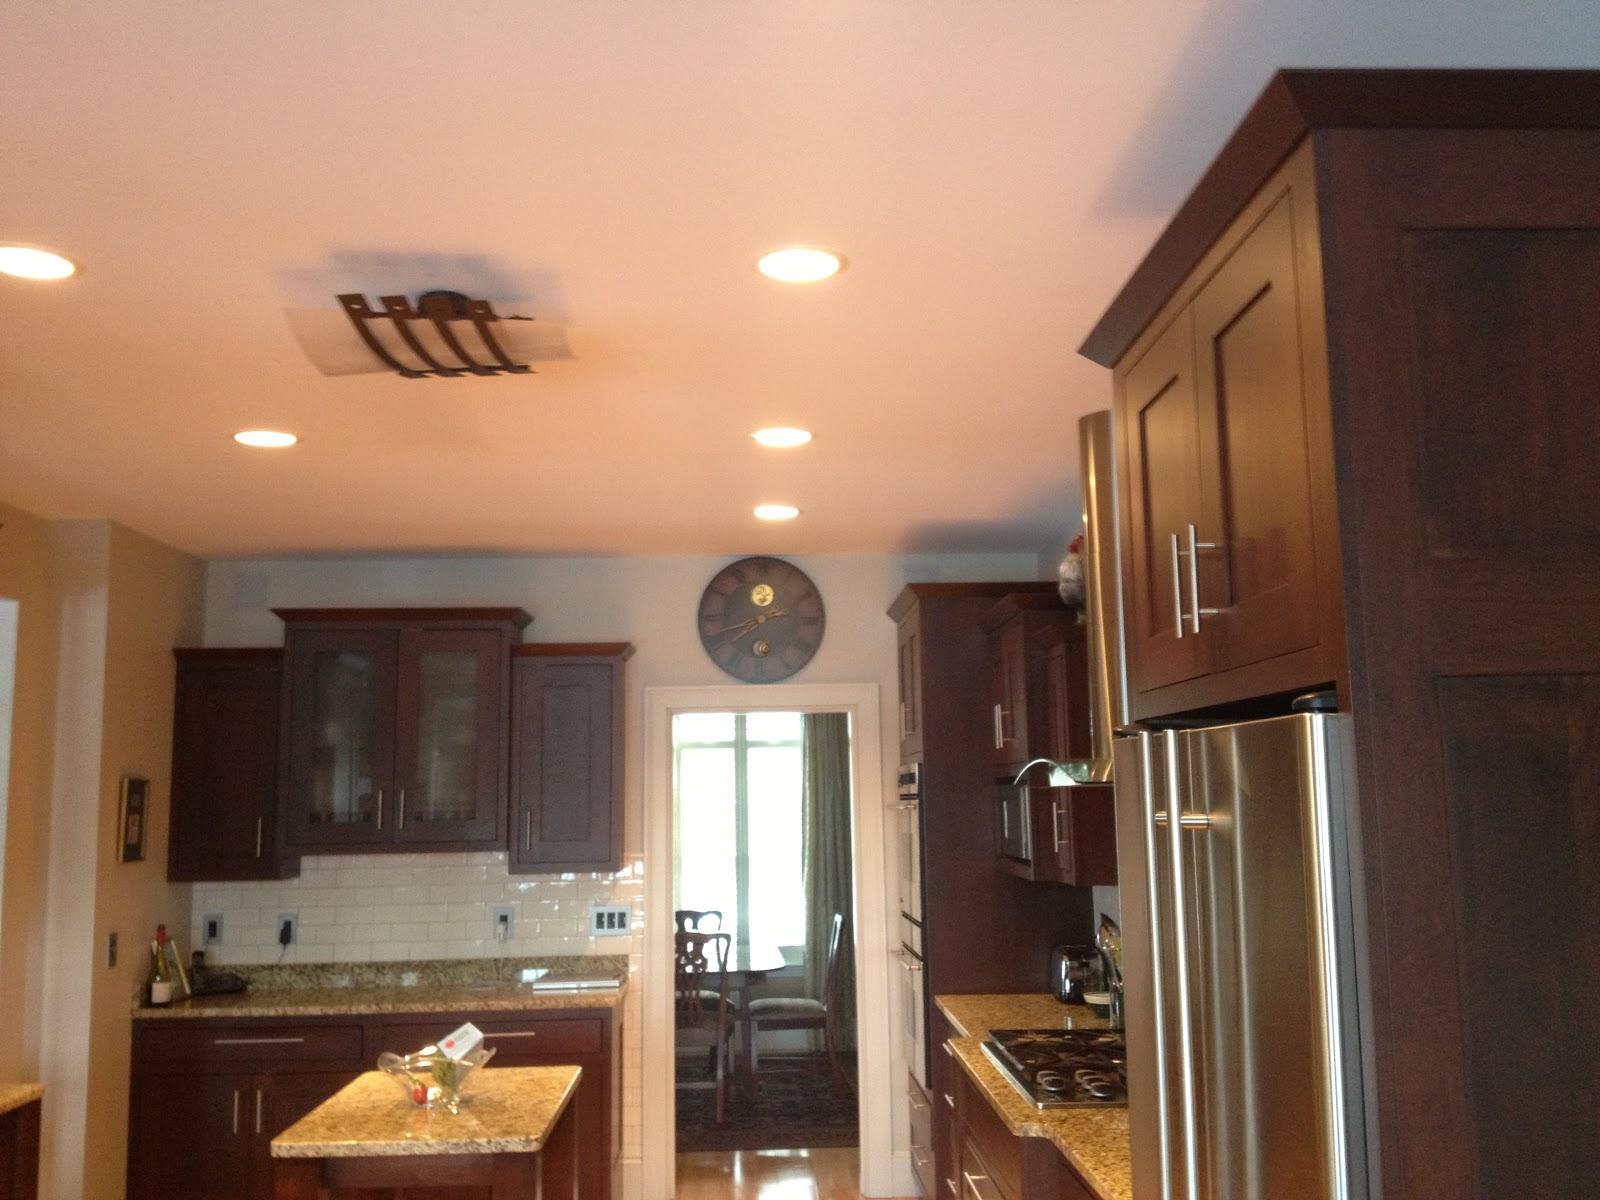 Fogg Lighting Best Uses Of Recessed Lighting